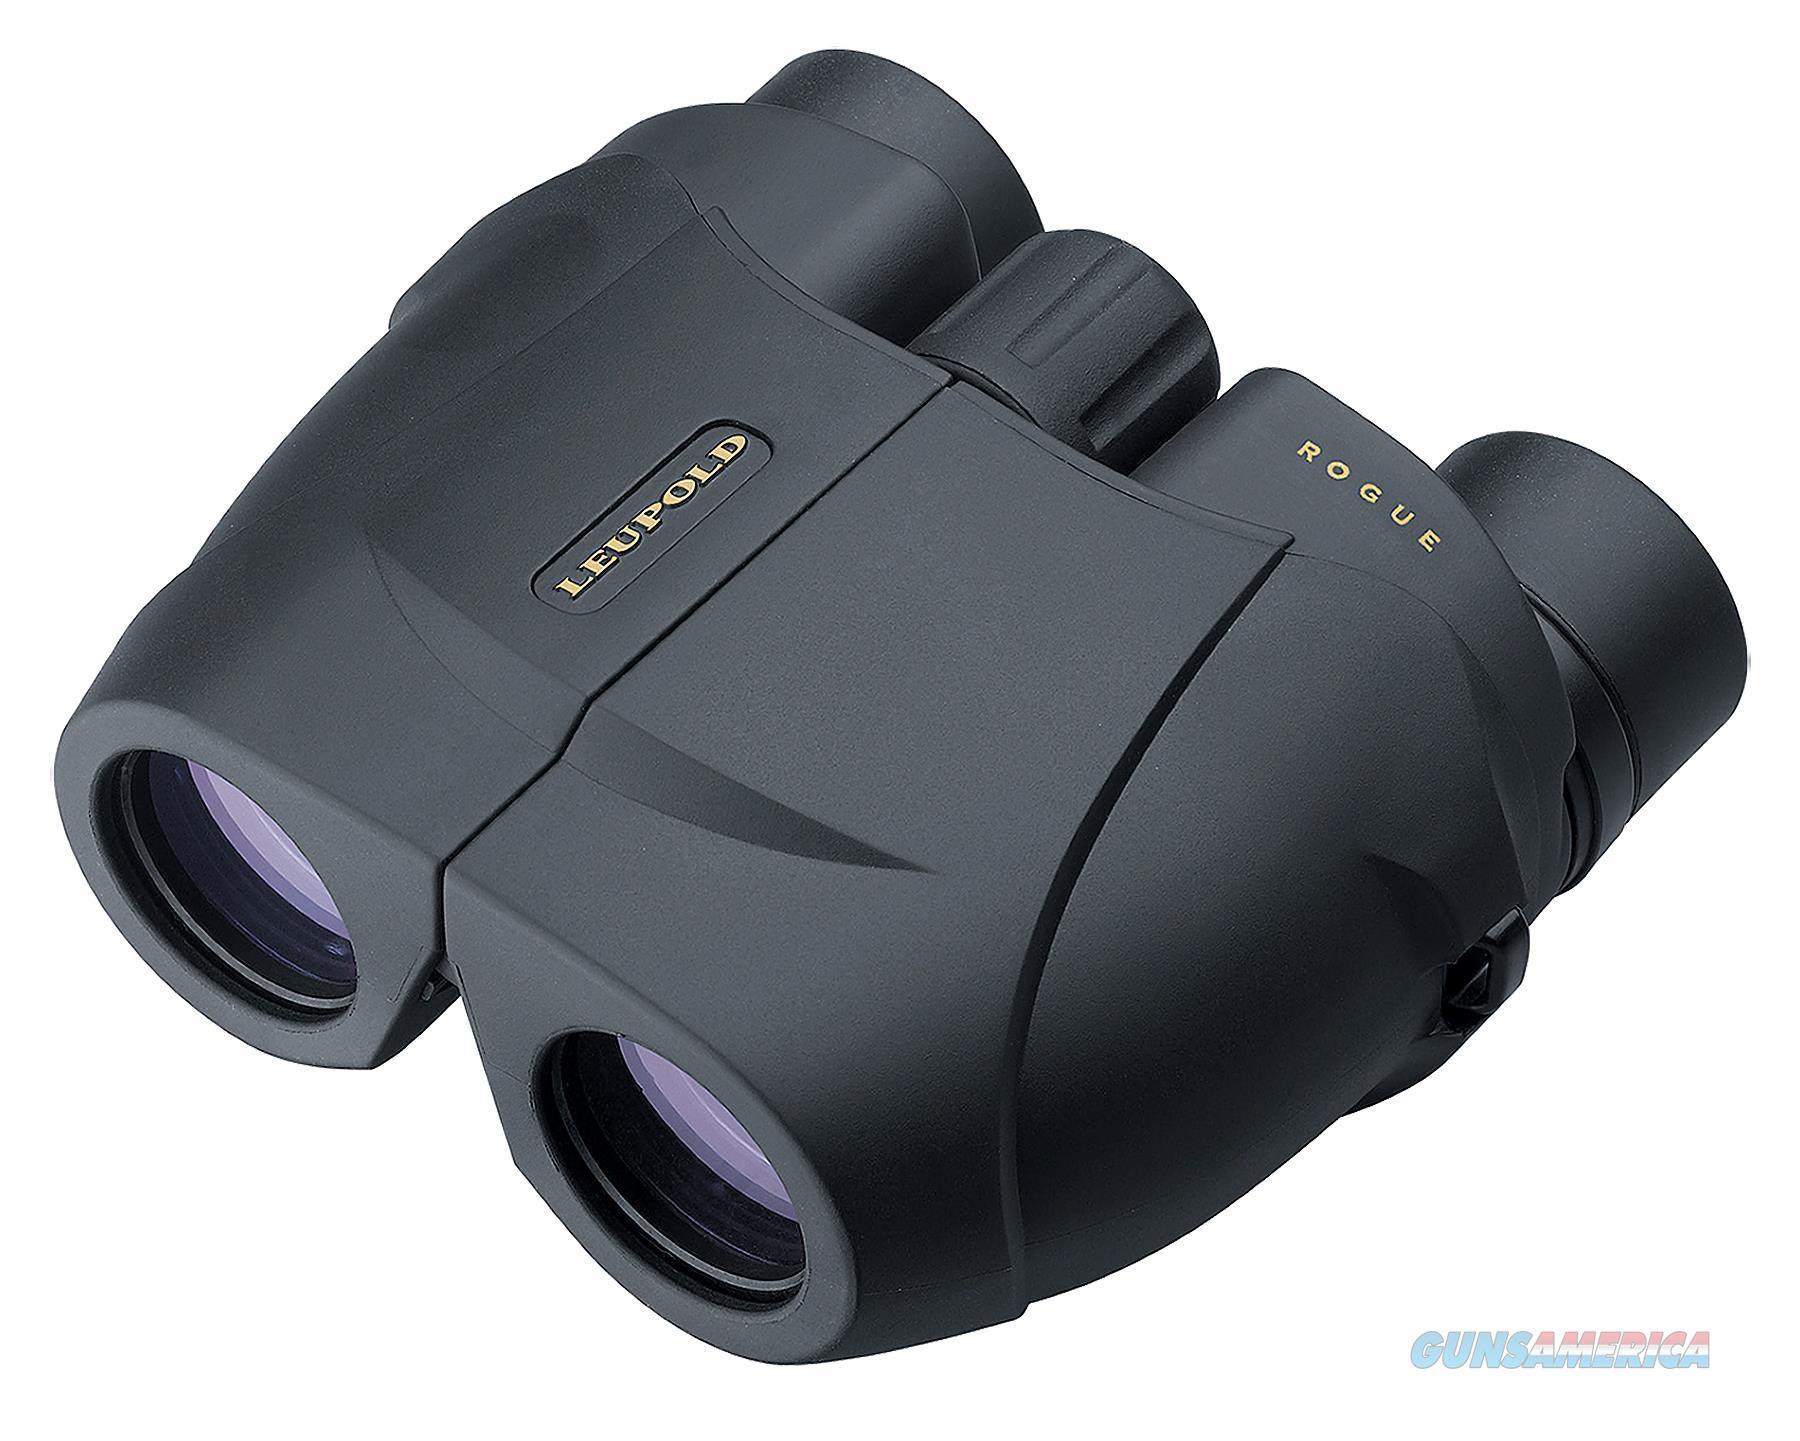 Leupold 59220 Bx-1 8X 25Mm 337 Ft @ 1000 Yds Fov 15Mm Eye Relief Black 59220  Non-Guns > Scopes/Mounts/Rings & Optics > Non-Scope Optics > Binoculars